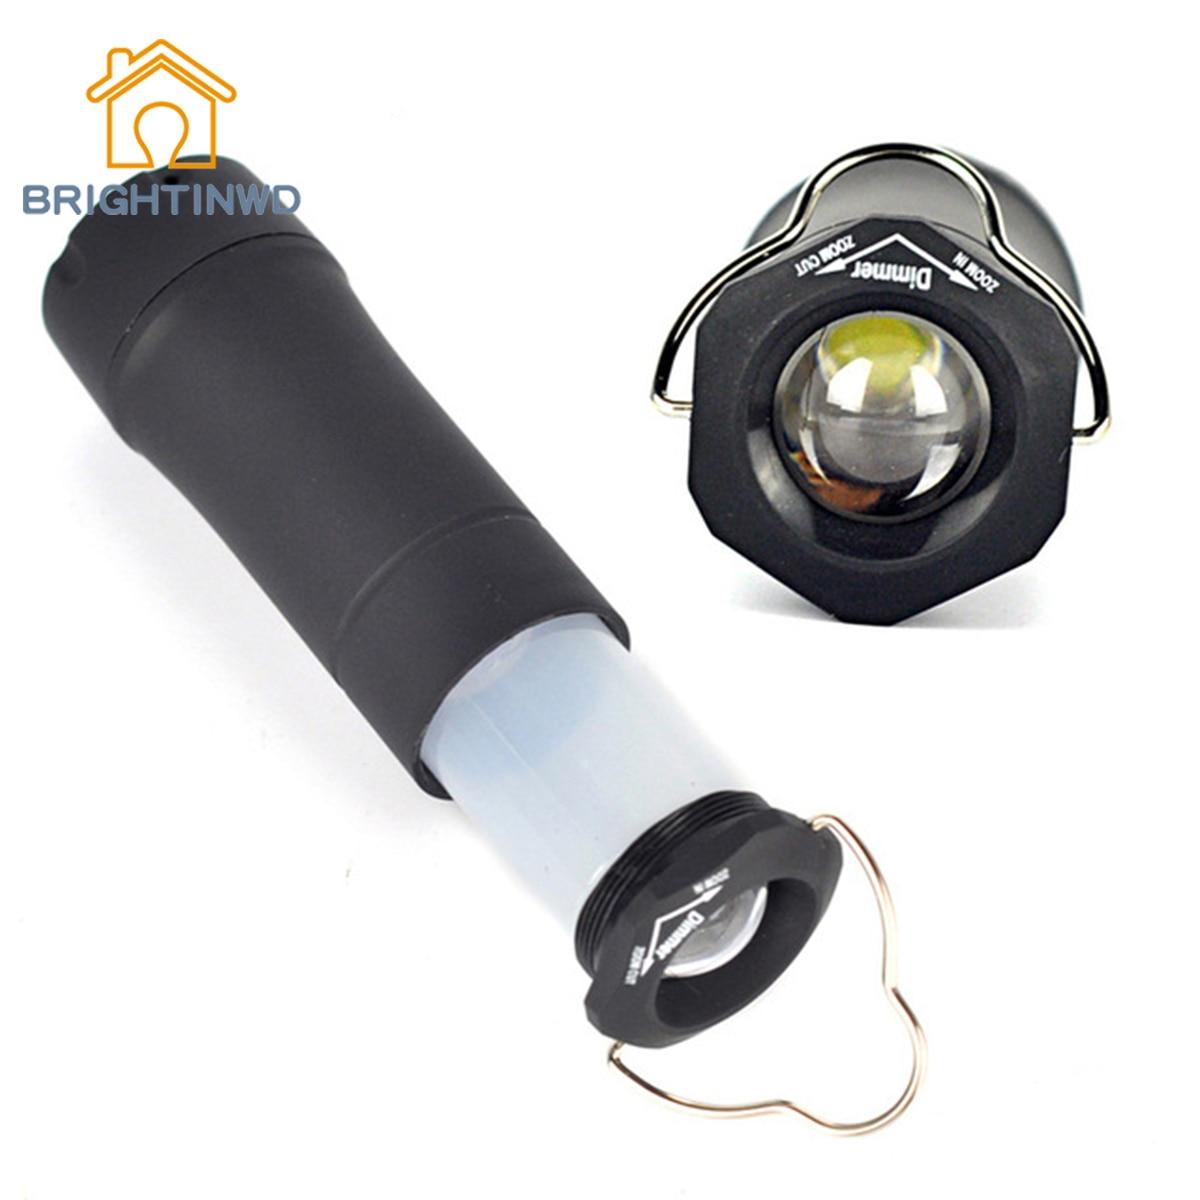 BRIGHTINWD 500LM LED Portable Lanterns 3-Mode Zoom Flashlight Camping Tent Lantern Light High Quality Camping Light Led Fener